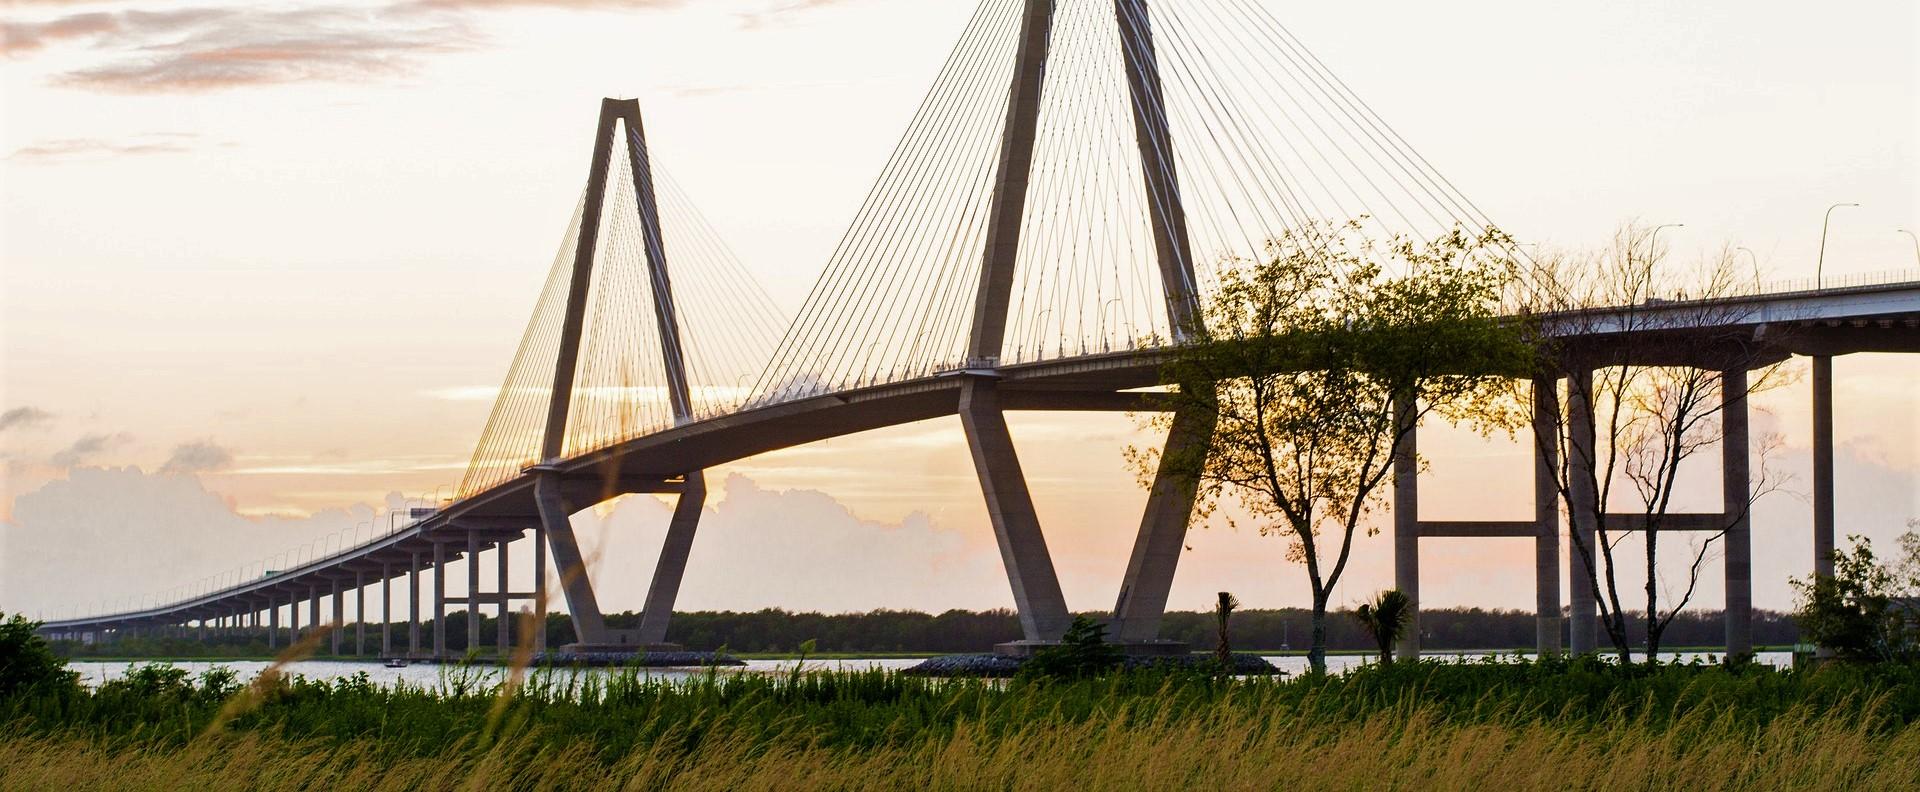 The 4,023 meter-long Charleston Bridge in South Carolina | Kids Car Donations